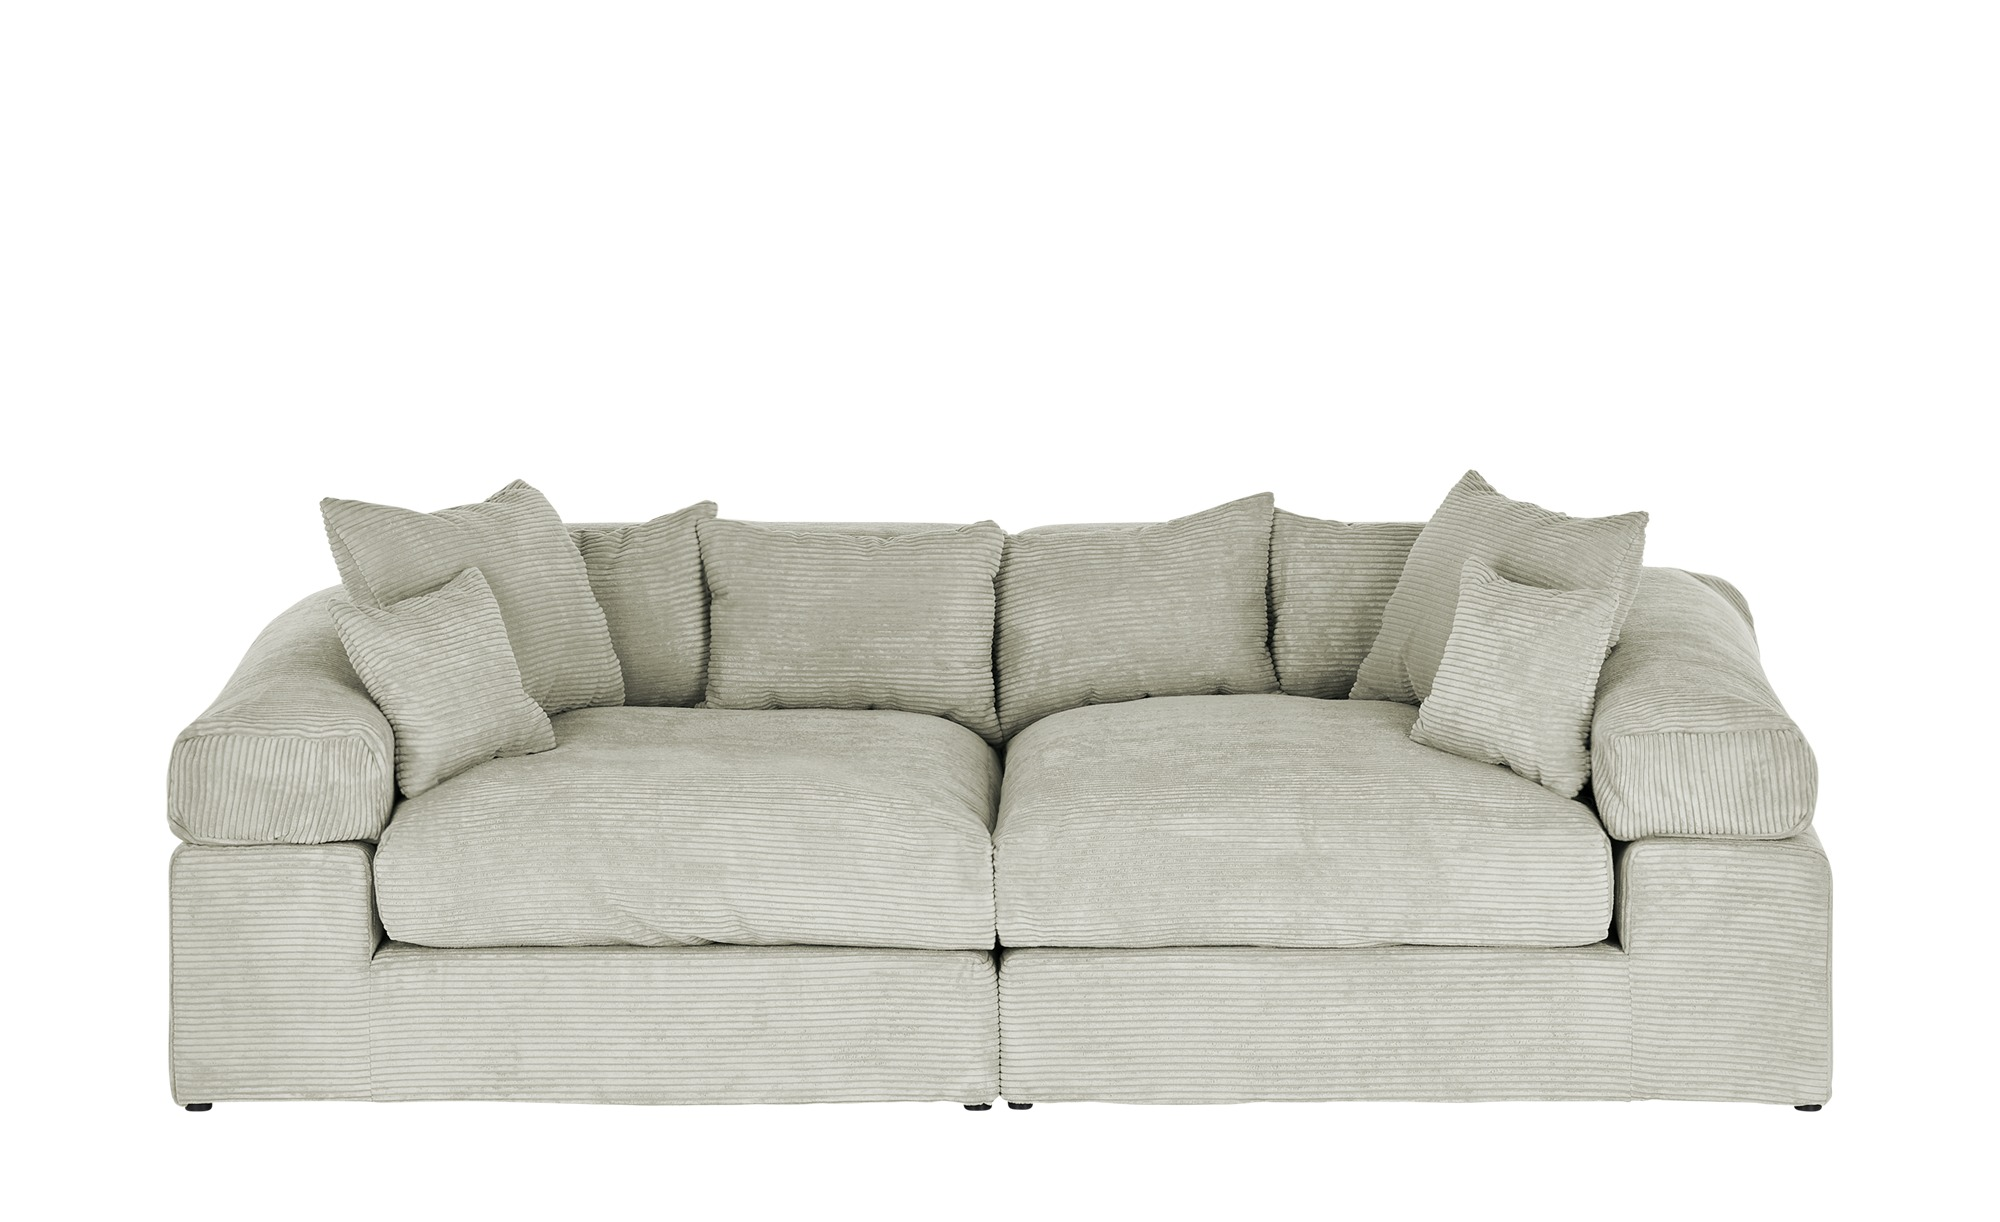 smart Big Sofa  Lianea ¦ beige ¦ Maße (cm): B: 276 H: 86 T: 138 Polstermöbel > Sofas > Big-Sofas - Höffner